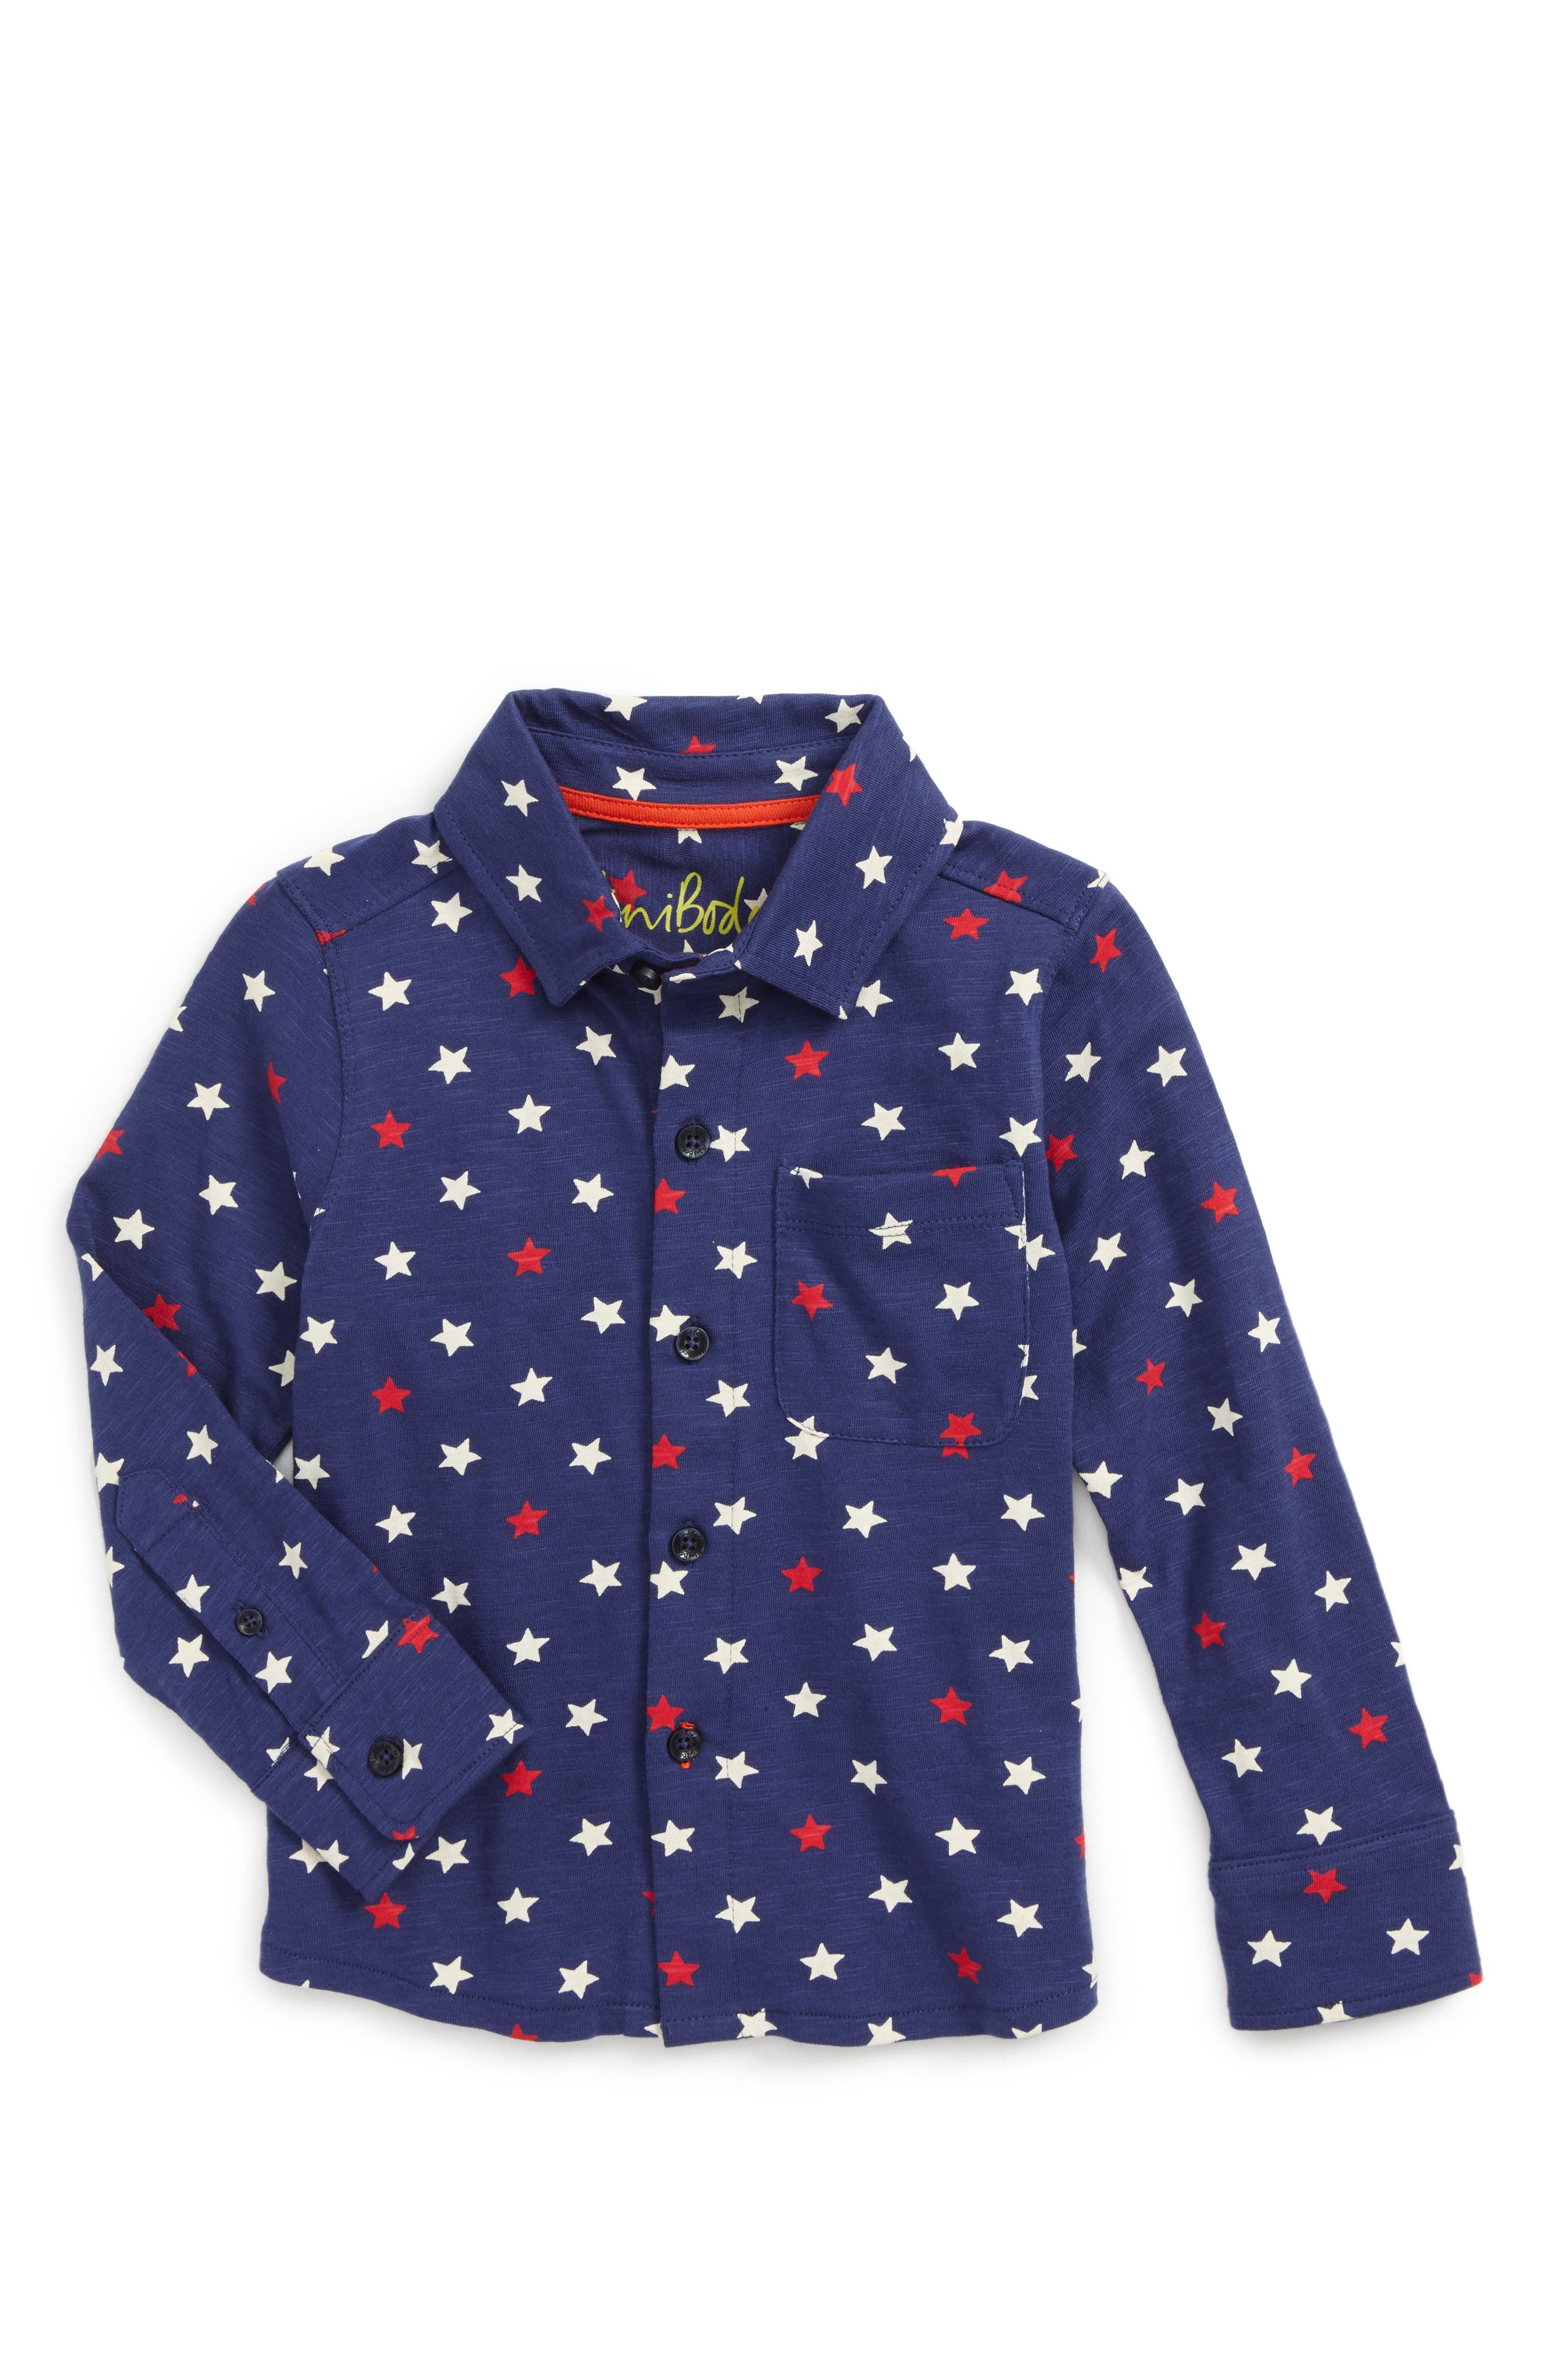 Main Image - Mini Boden Star Print Jersey Shirt (Toddler Boys, Little Boys & Big Boys)